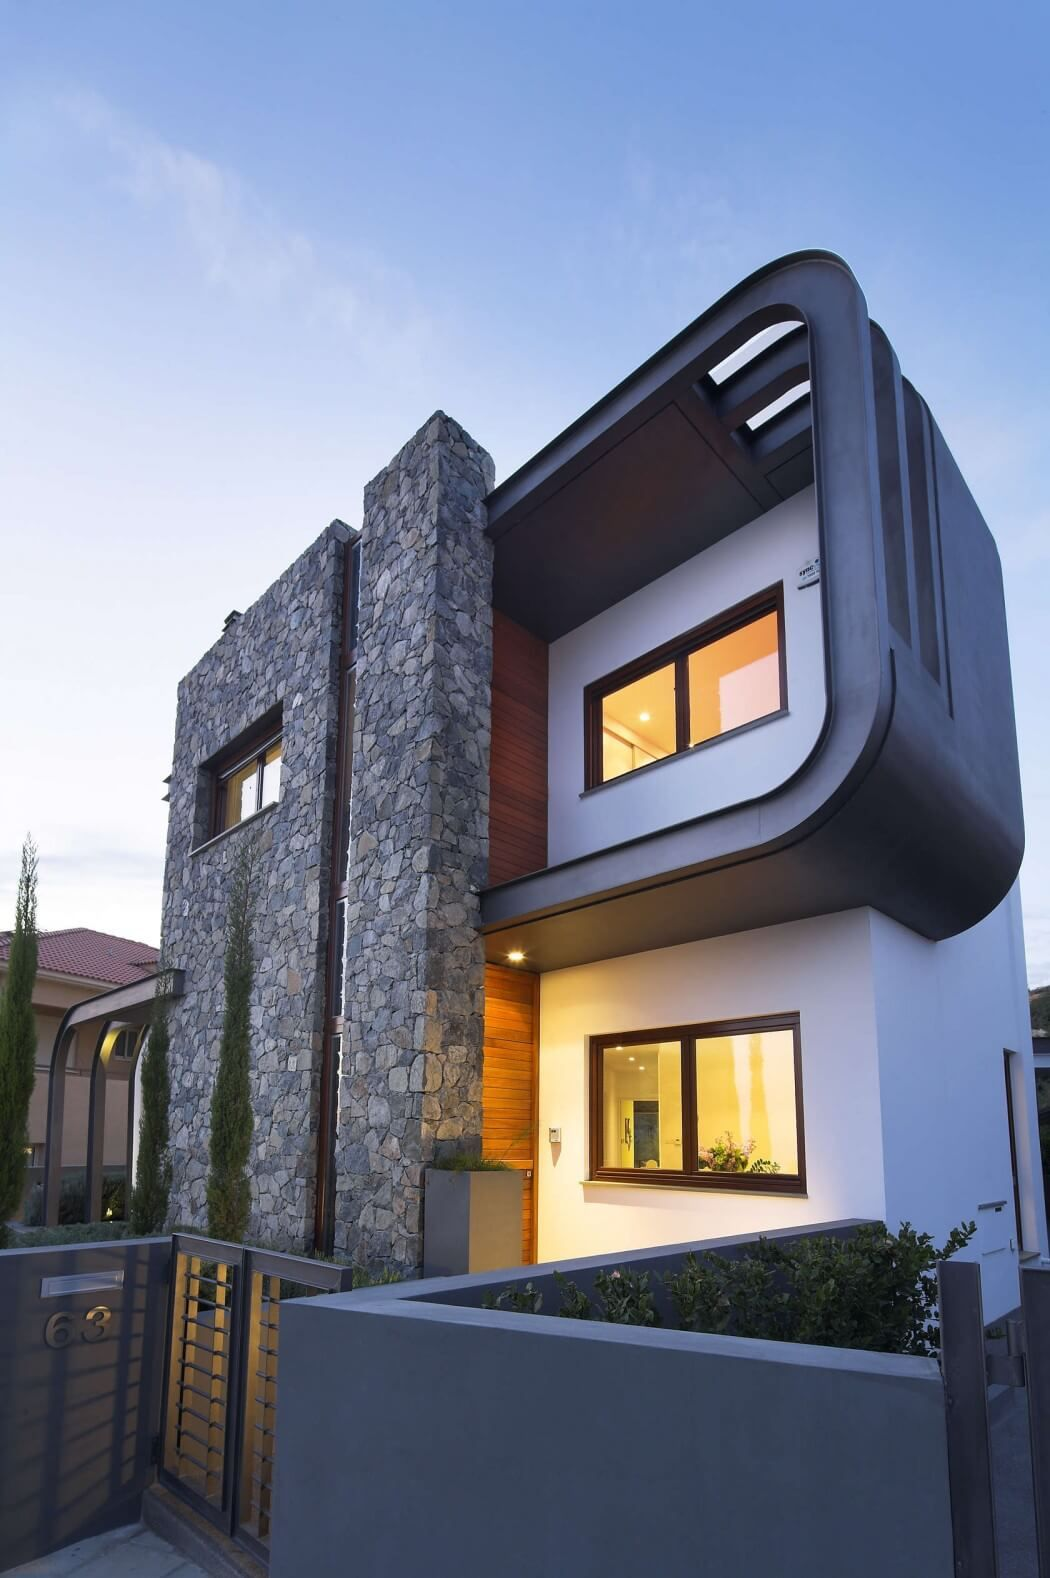 Dise o de casa moderna de dos plantas estructura de acero for Casas modernas futuristas